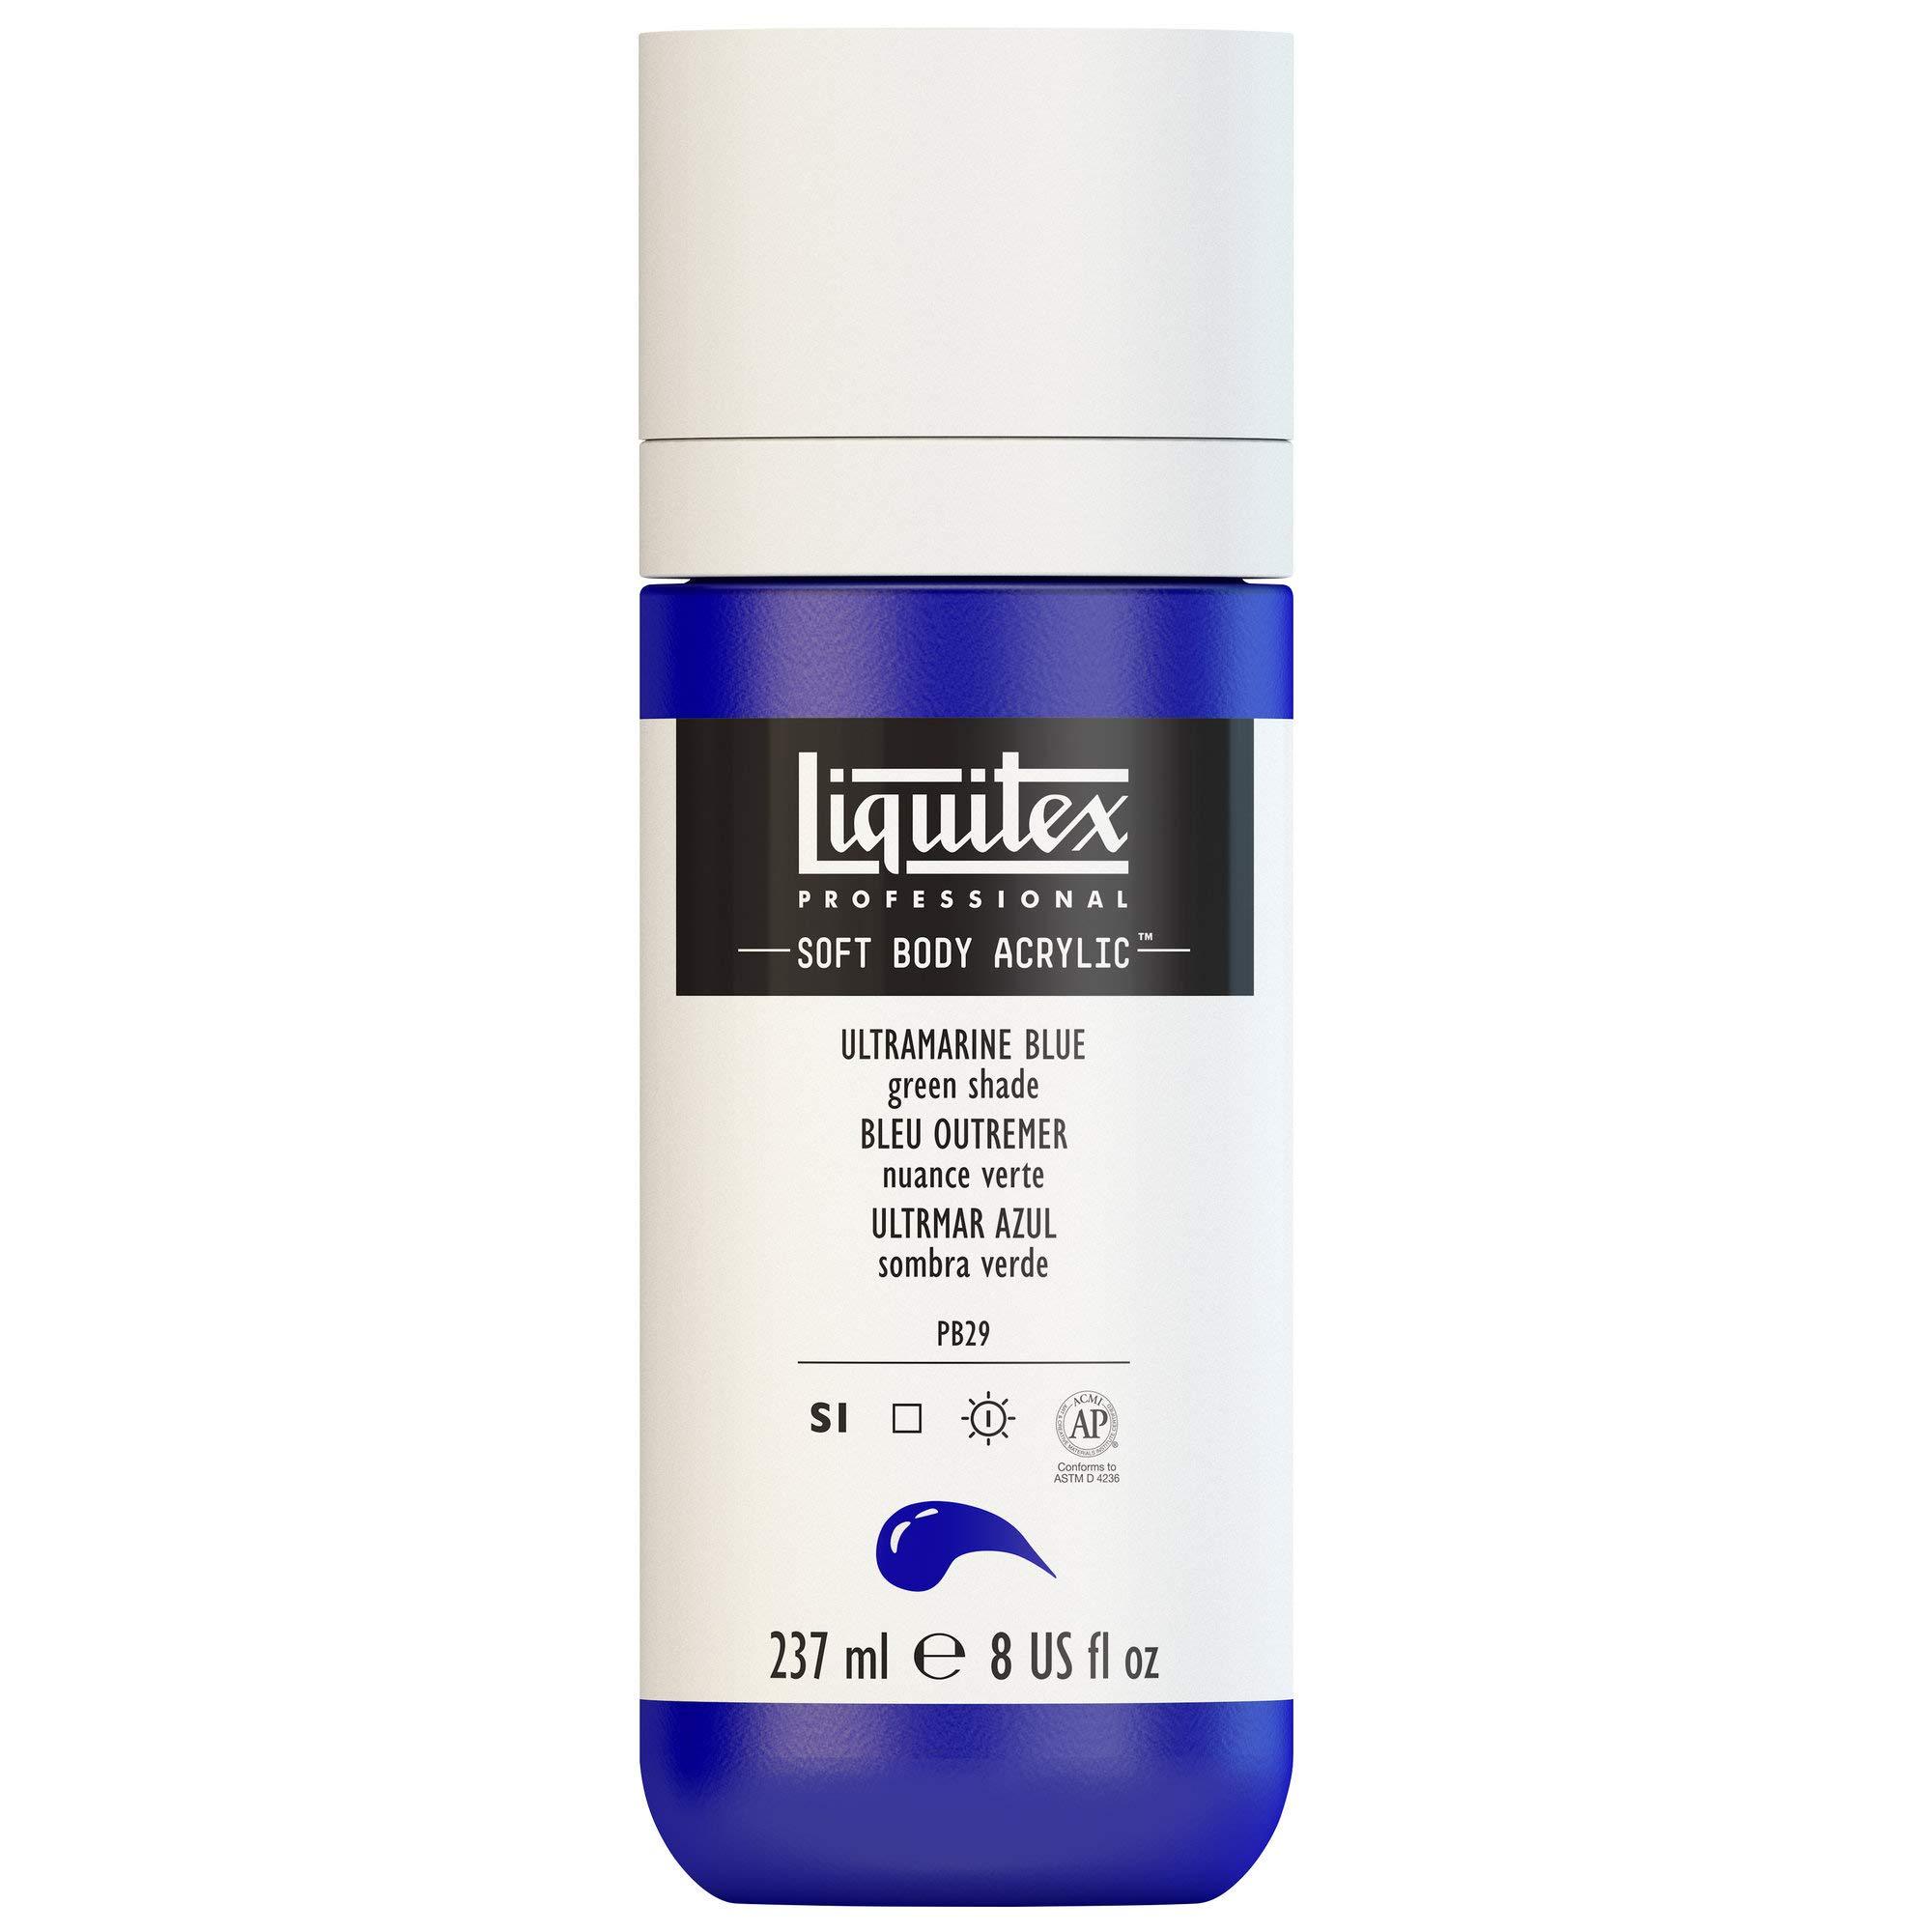 Liquitex Professional Soft Body Acrylic Paint 8-oz bottle, Ultramarine Blue (Green Shade)